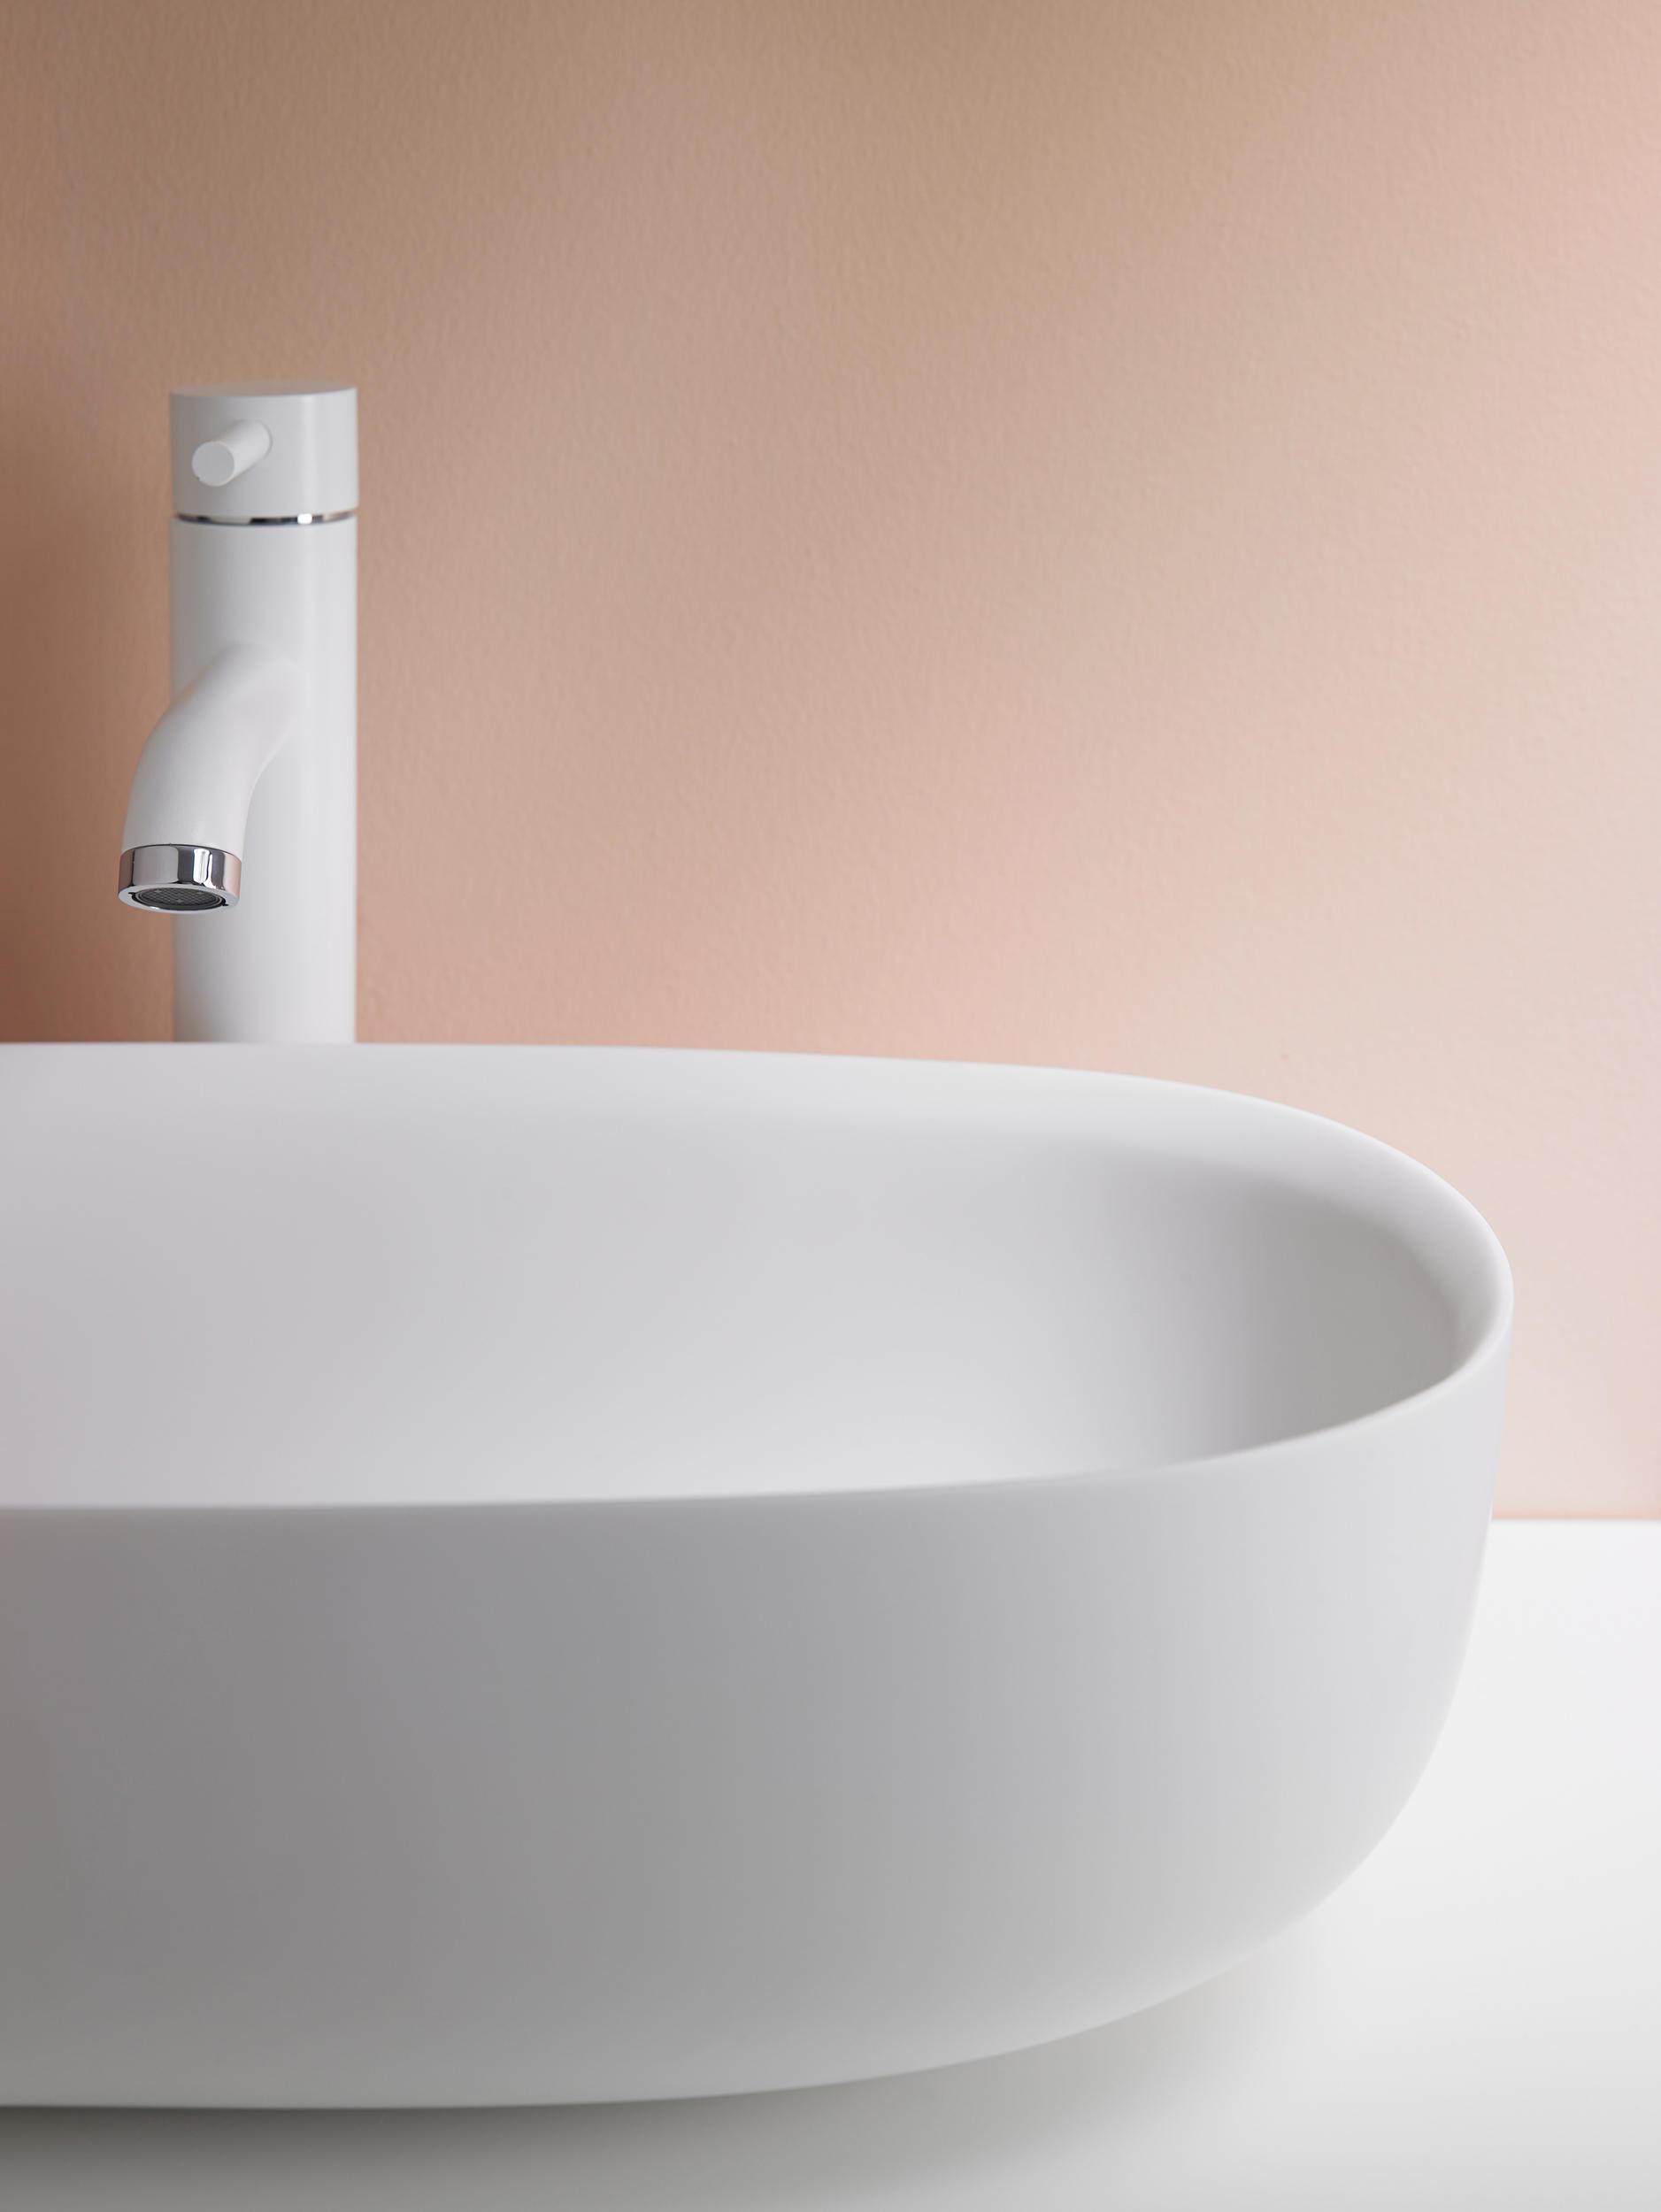 BOWL BATHROOM FURNITURE SET 1 - Wash basins from Inbani | Architonic